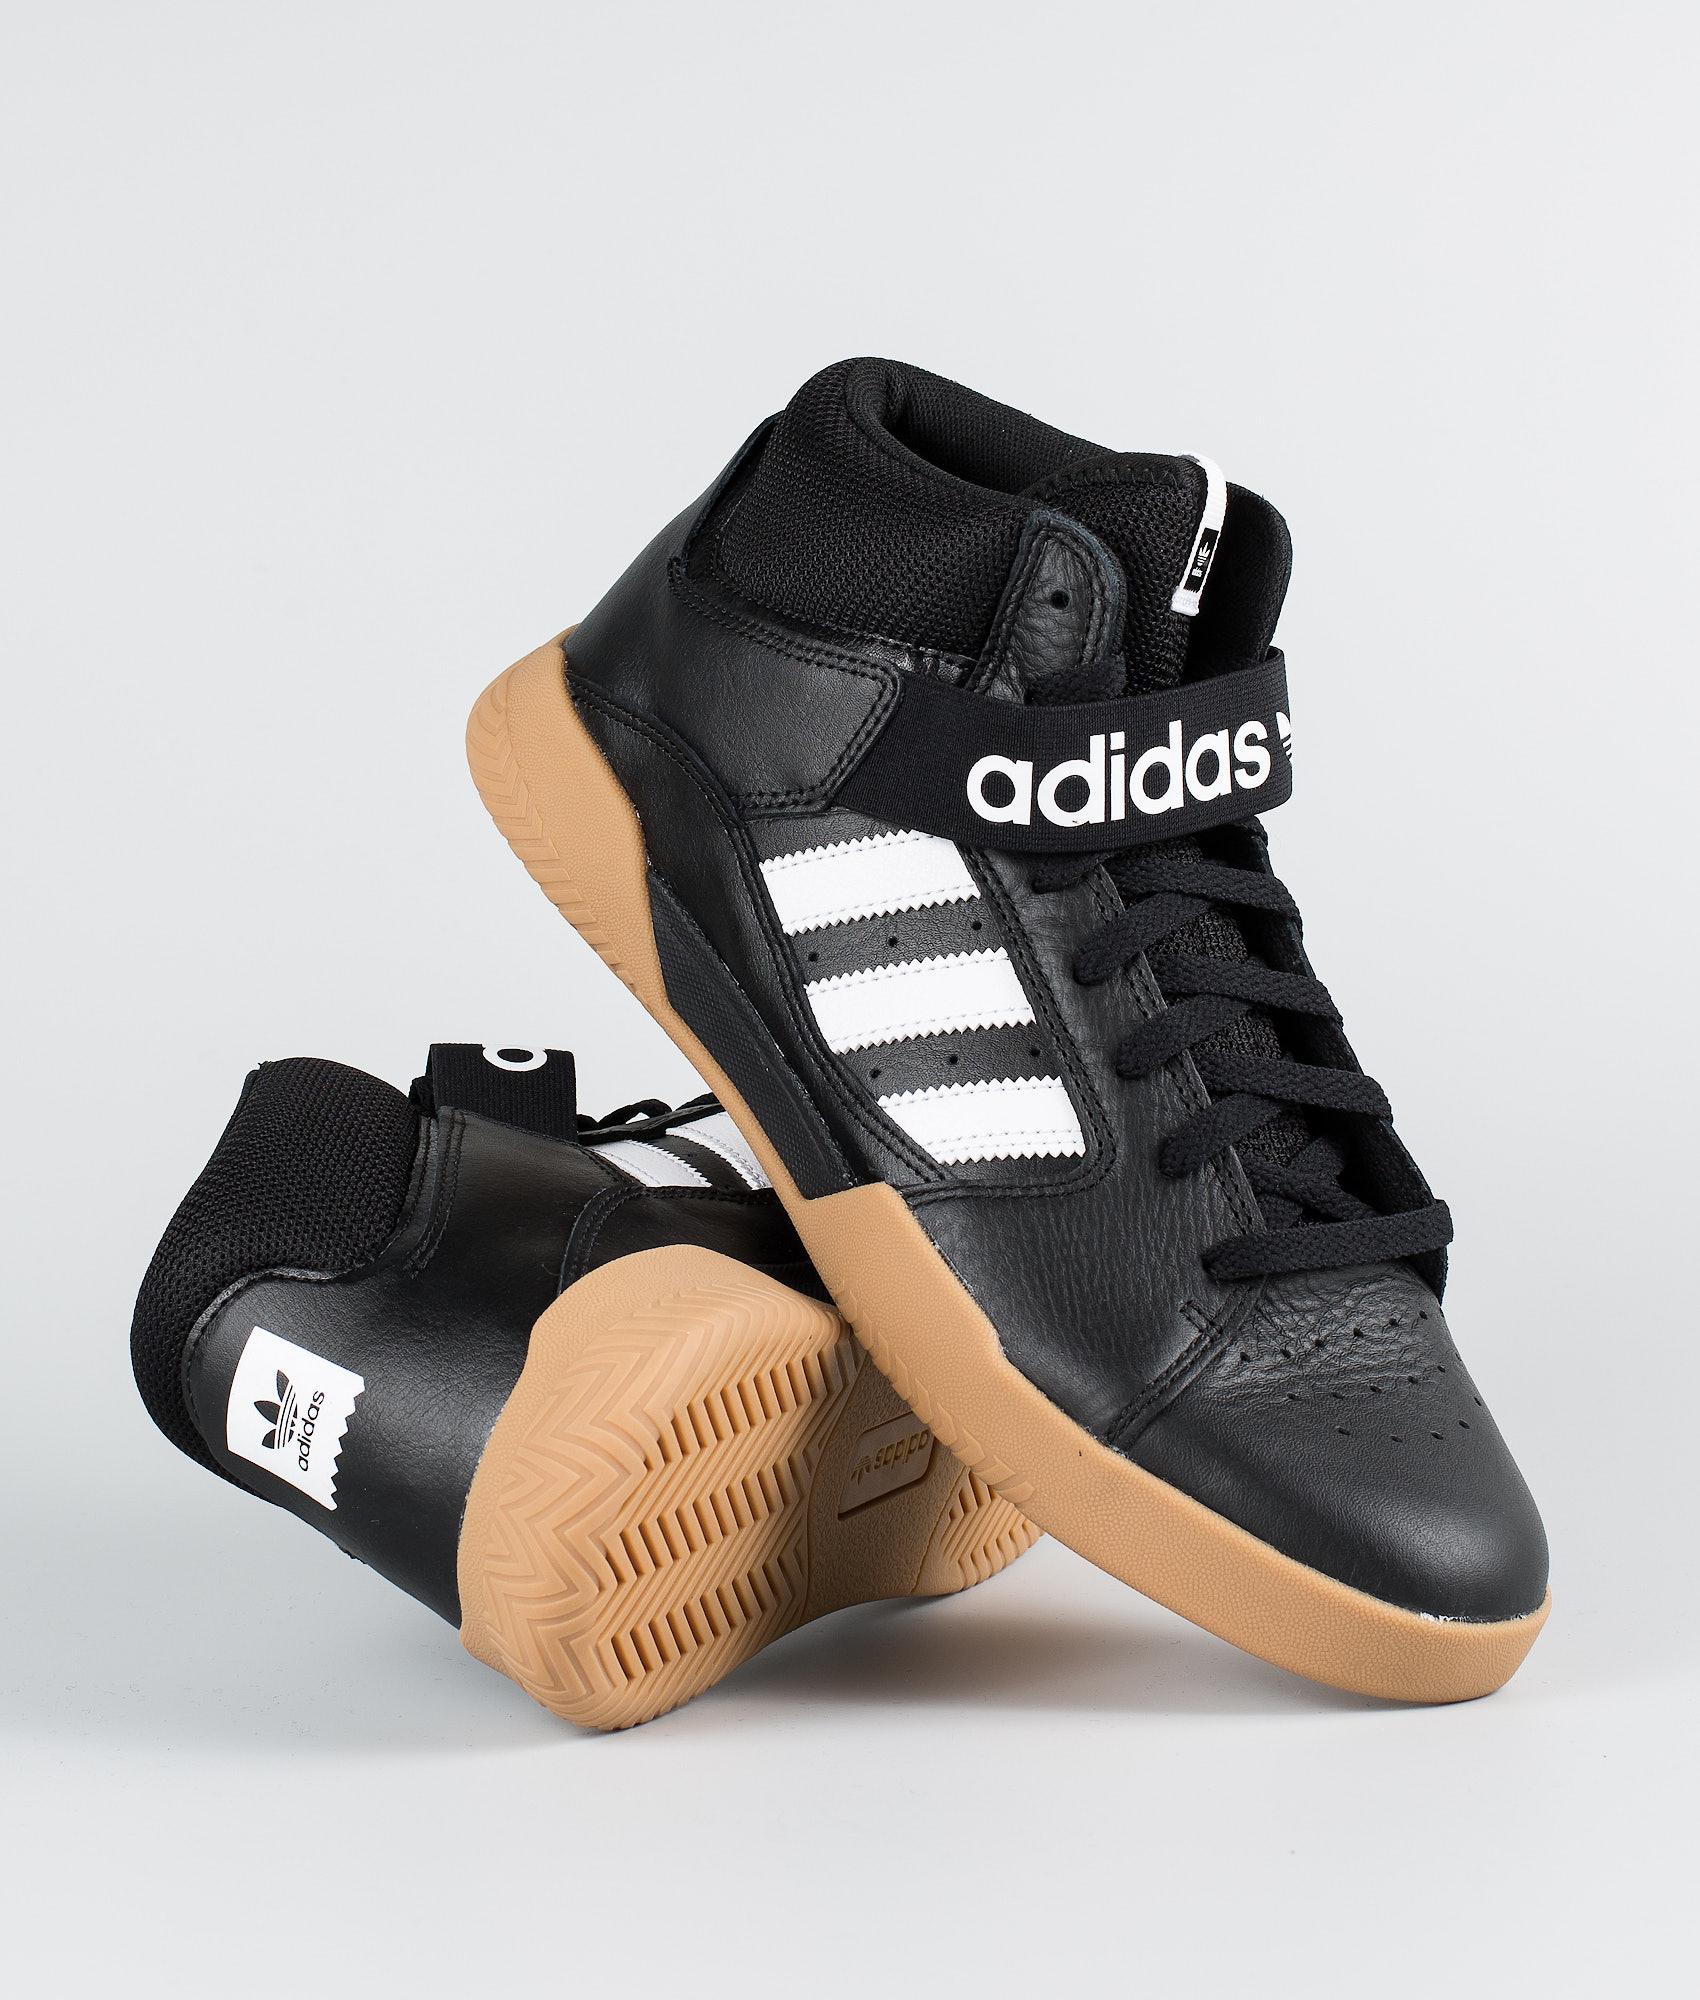 9f1e30dab819 Adidas Skateboarding Vrx Mid Shoes Black. Core Black Ftwr White Gum4